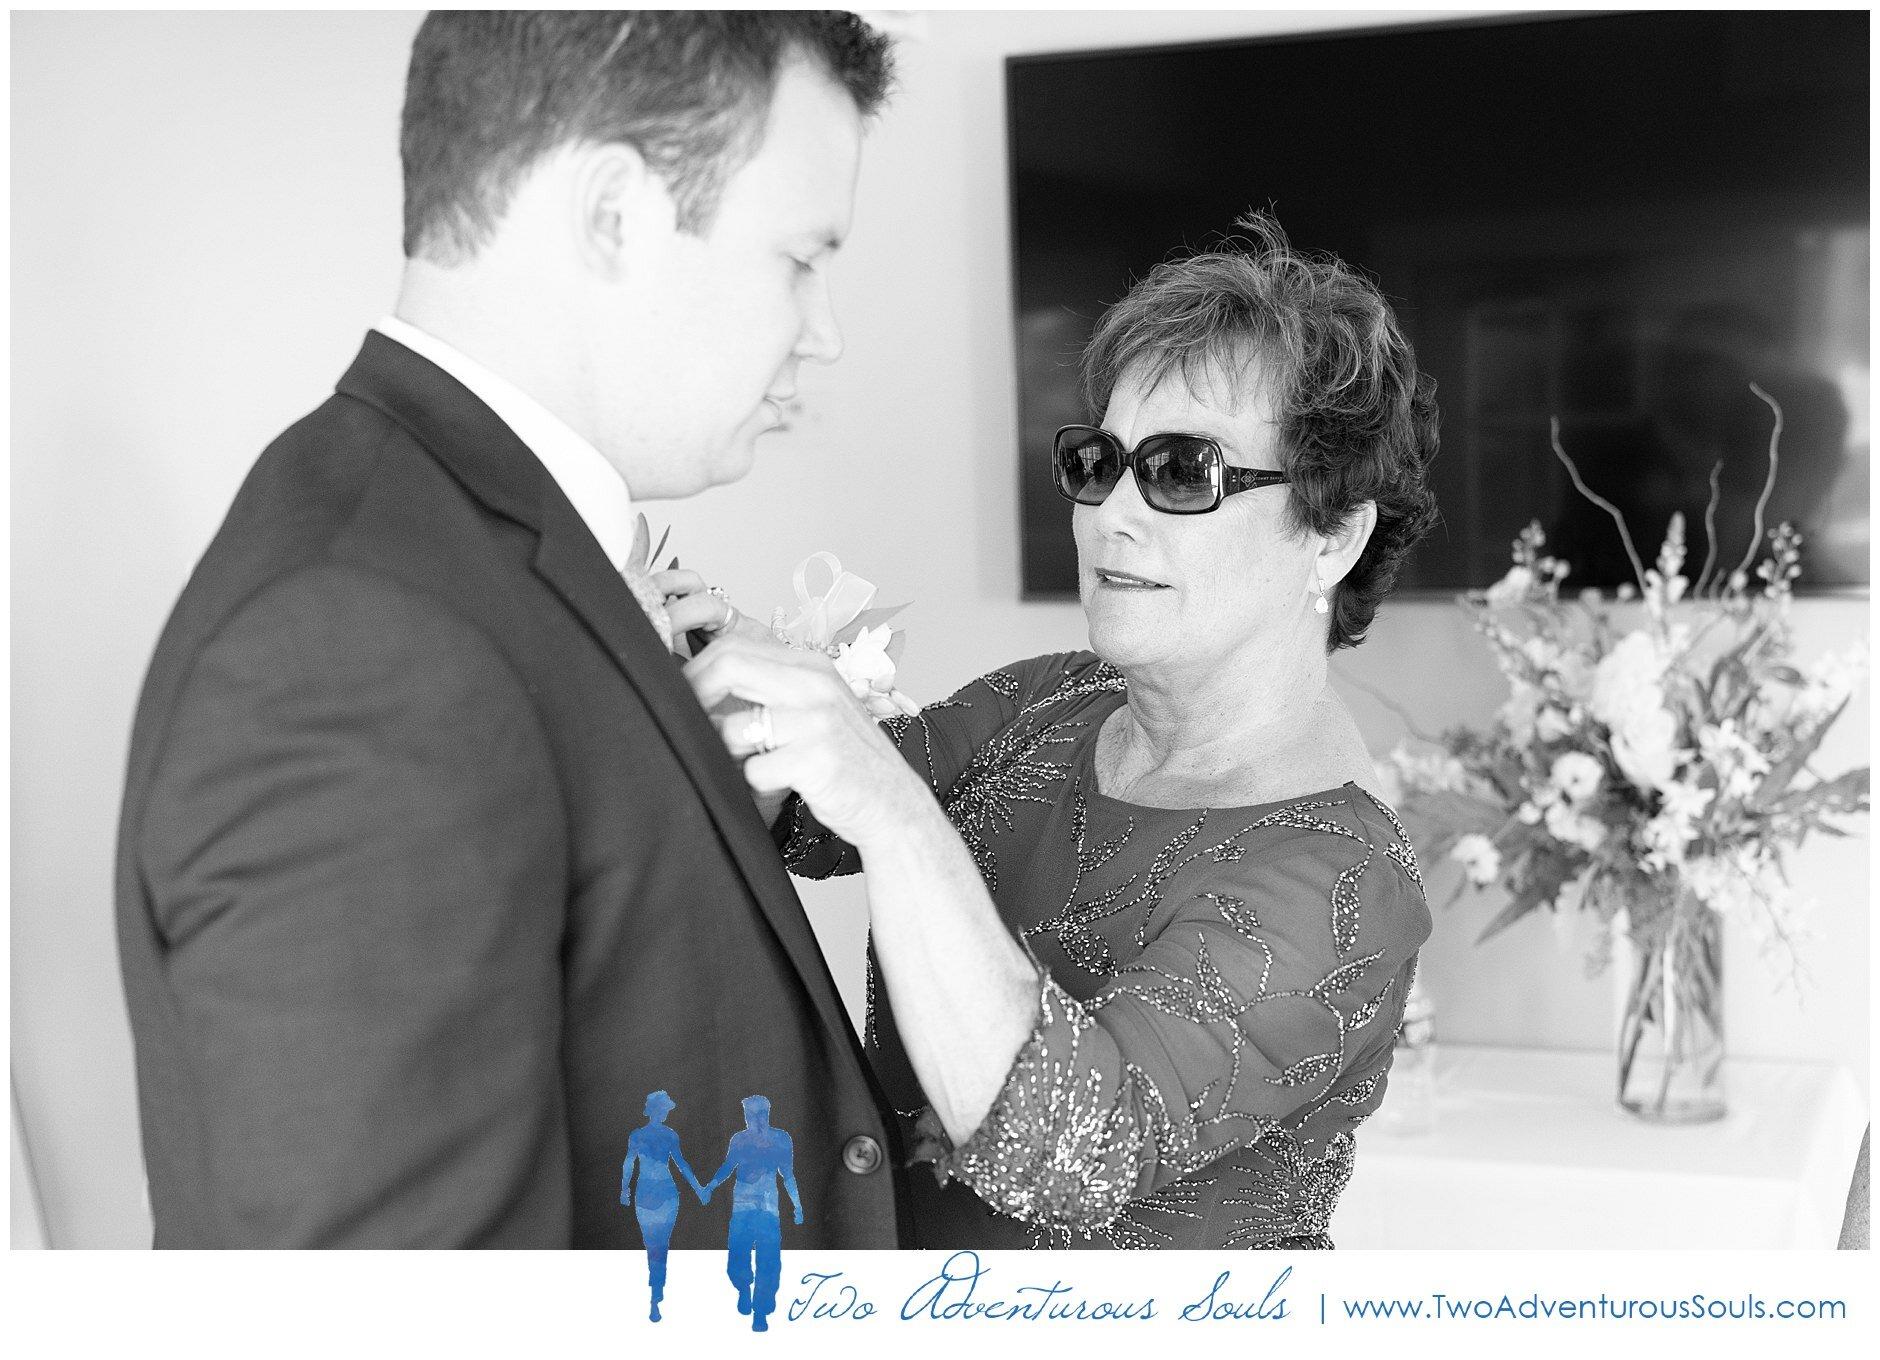 Breakwater Inn and Spa Wedding Photographers, Kennebunkport Wedding Photographers, Two Adventurous Souls- 092119_0011.jpg